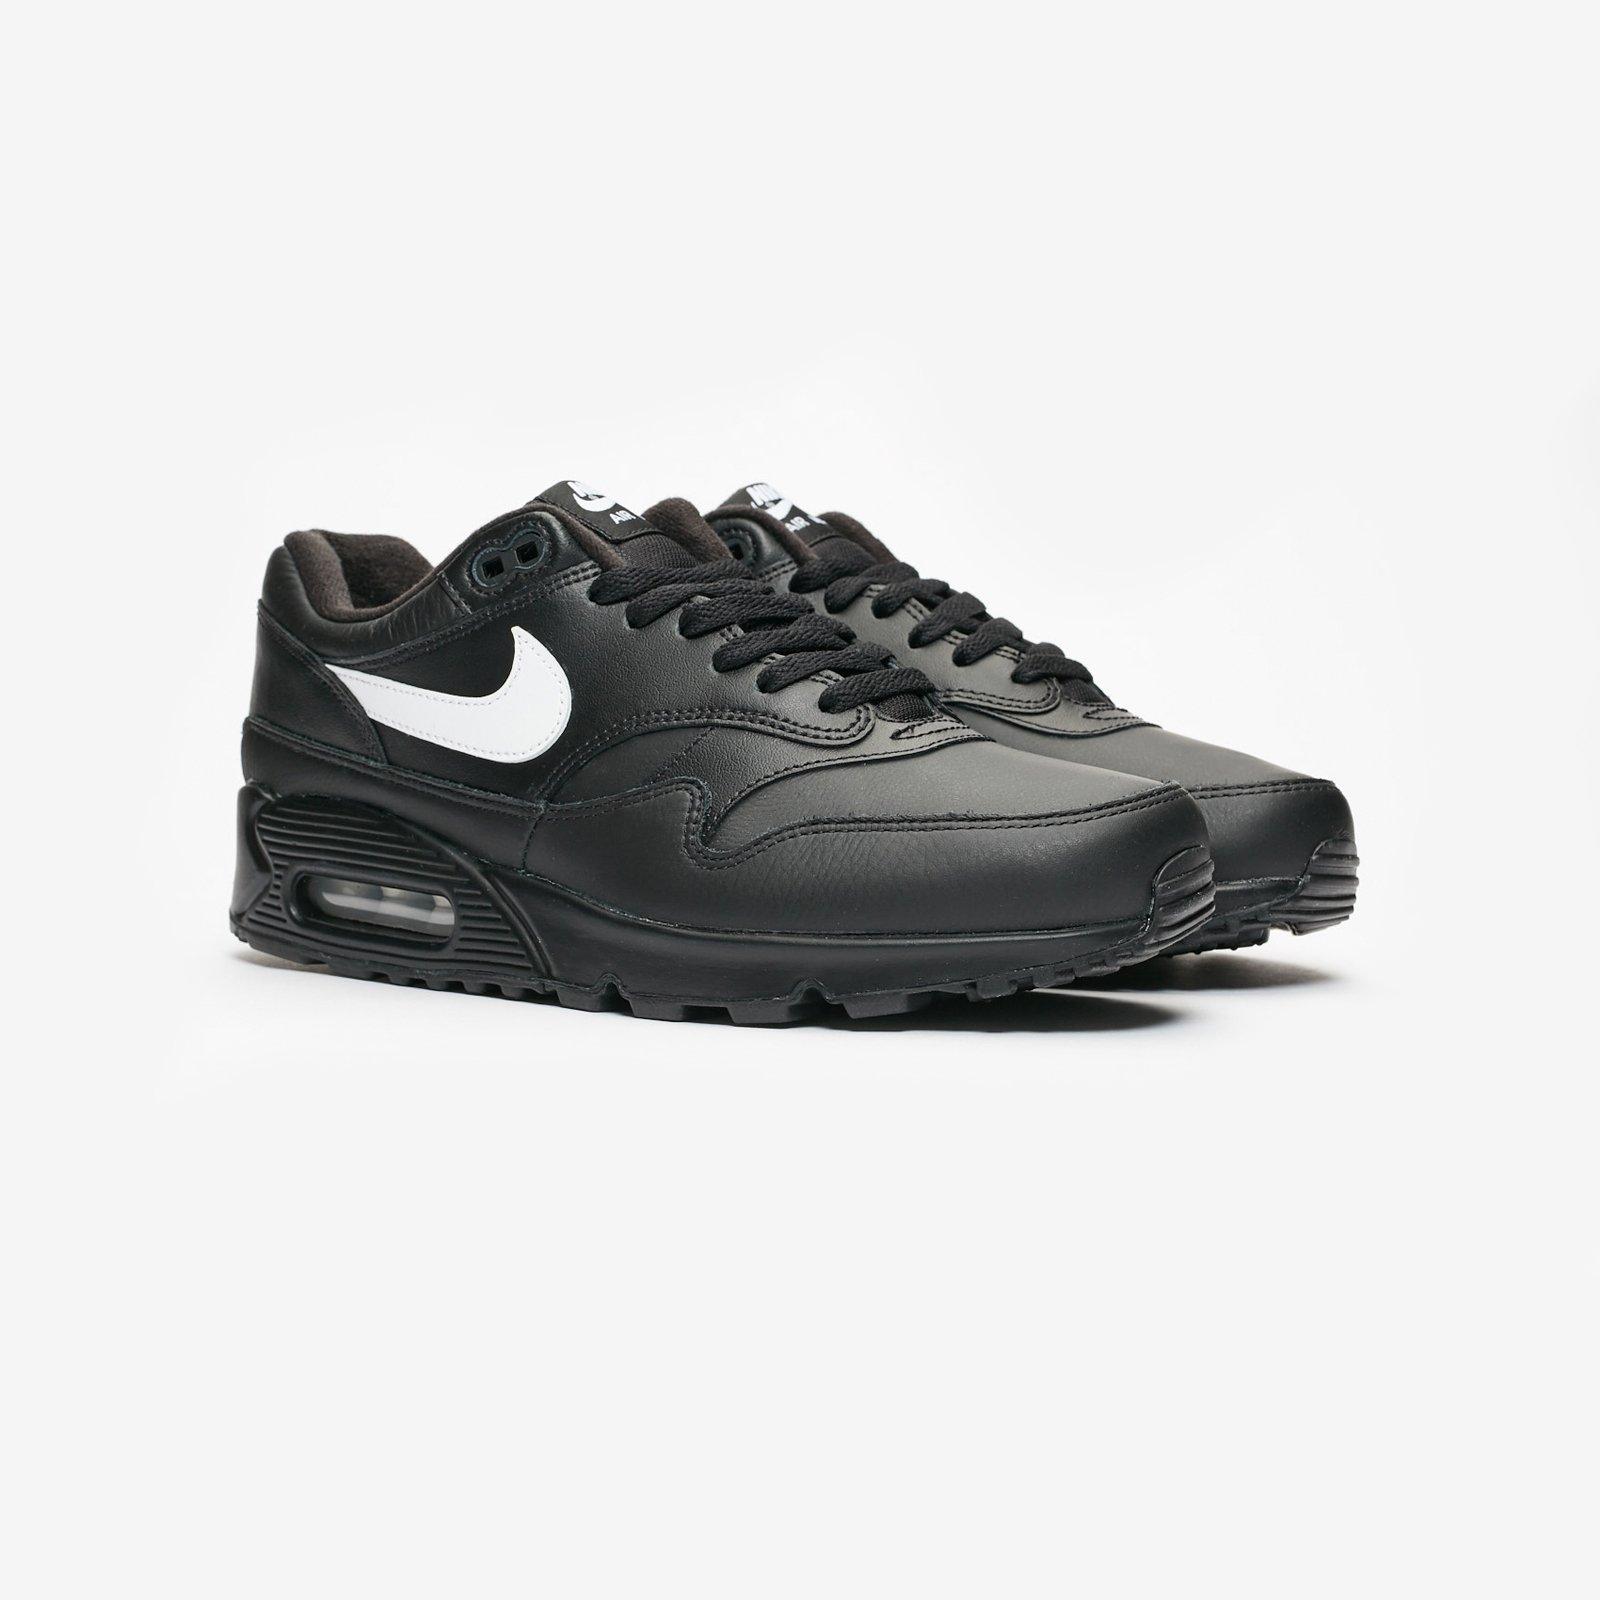 wholesale dealer 7477b 1a487 Nike Air Max 90/1 - Aj7695-001 - Sneakersnstuff | sneakers ...